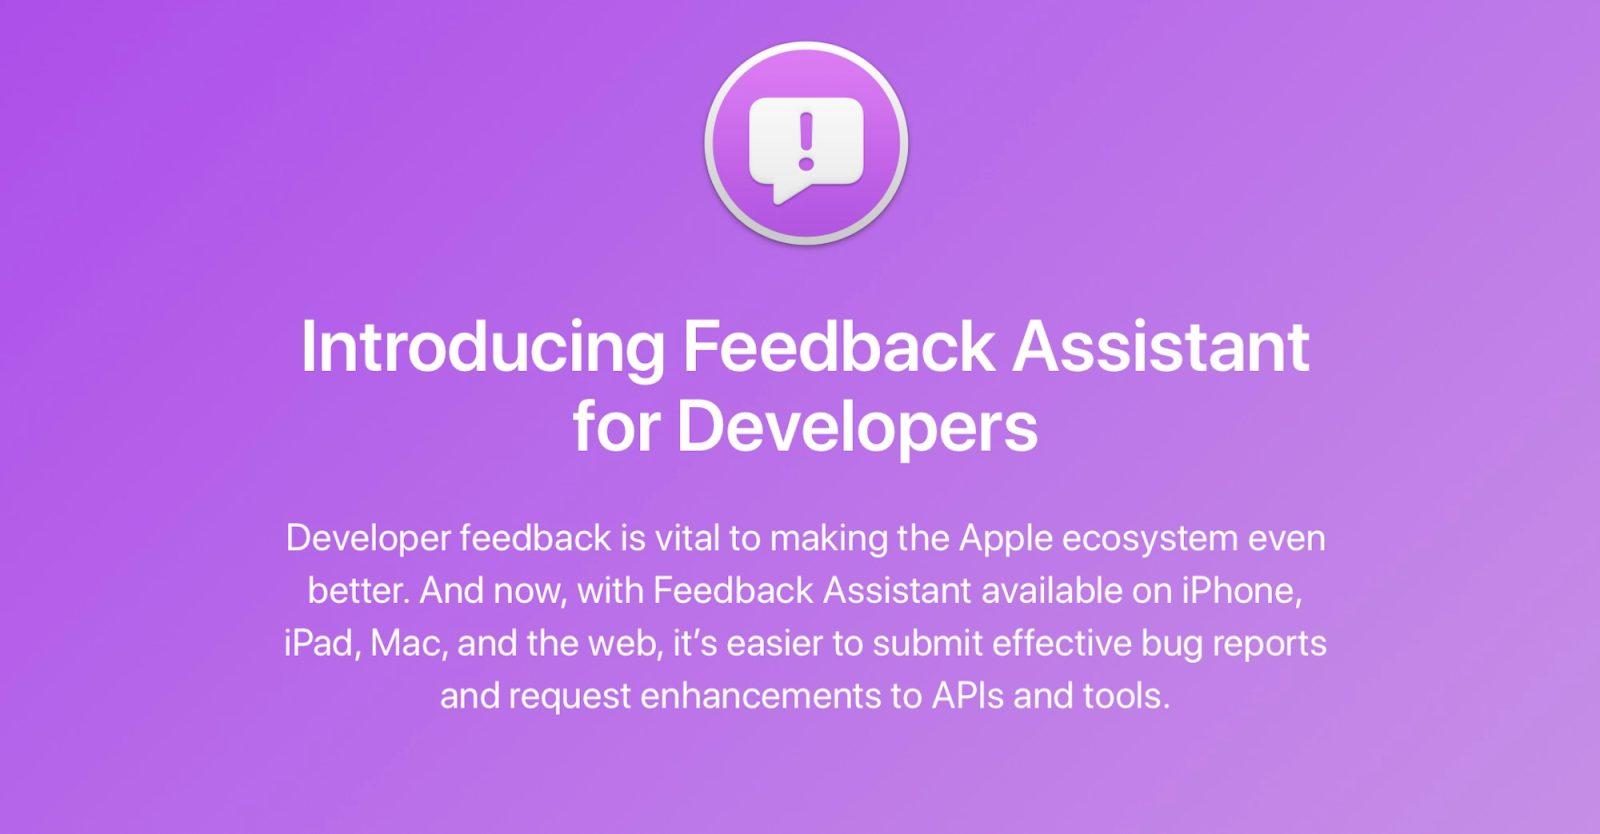 Apple expands Feedback Assistant platform to developers, replacing Bug Reporter